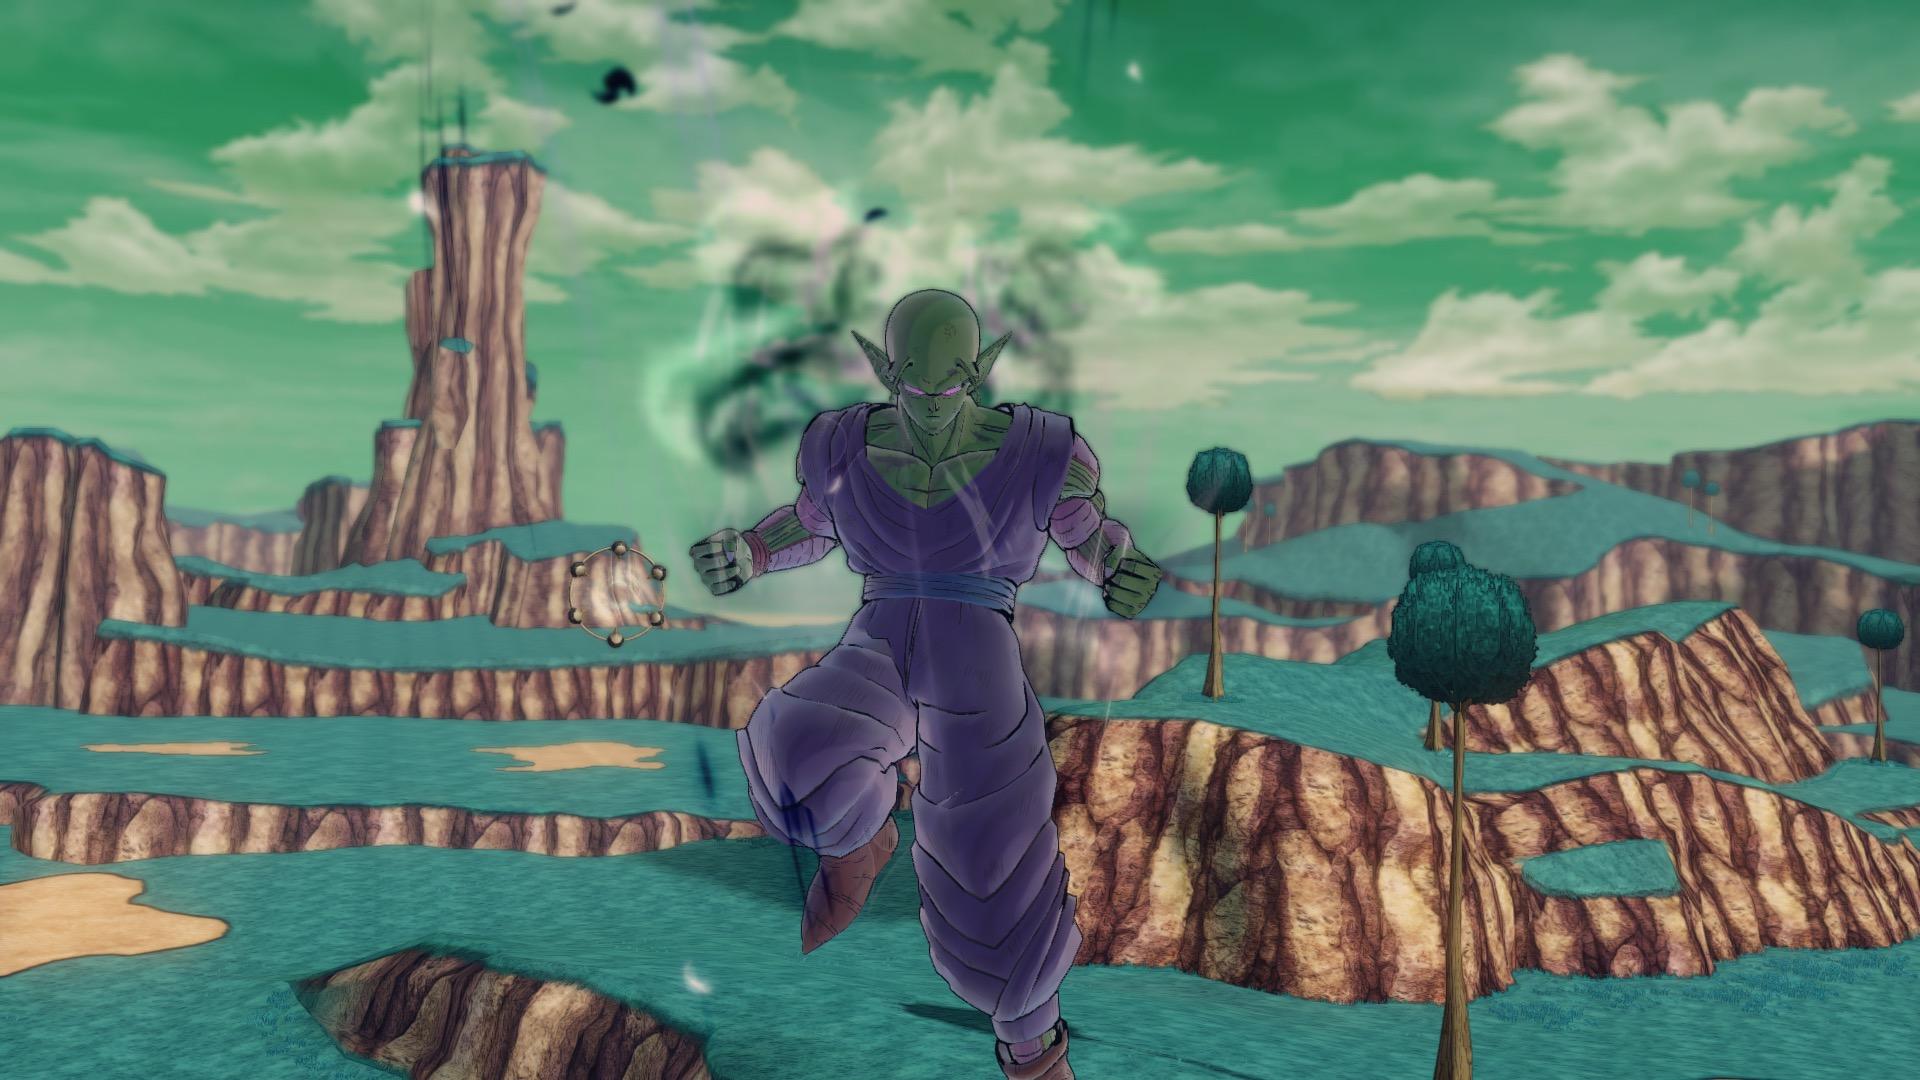 Piccolo (Xenoverse 2)